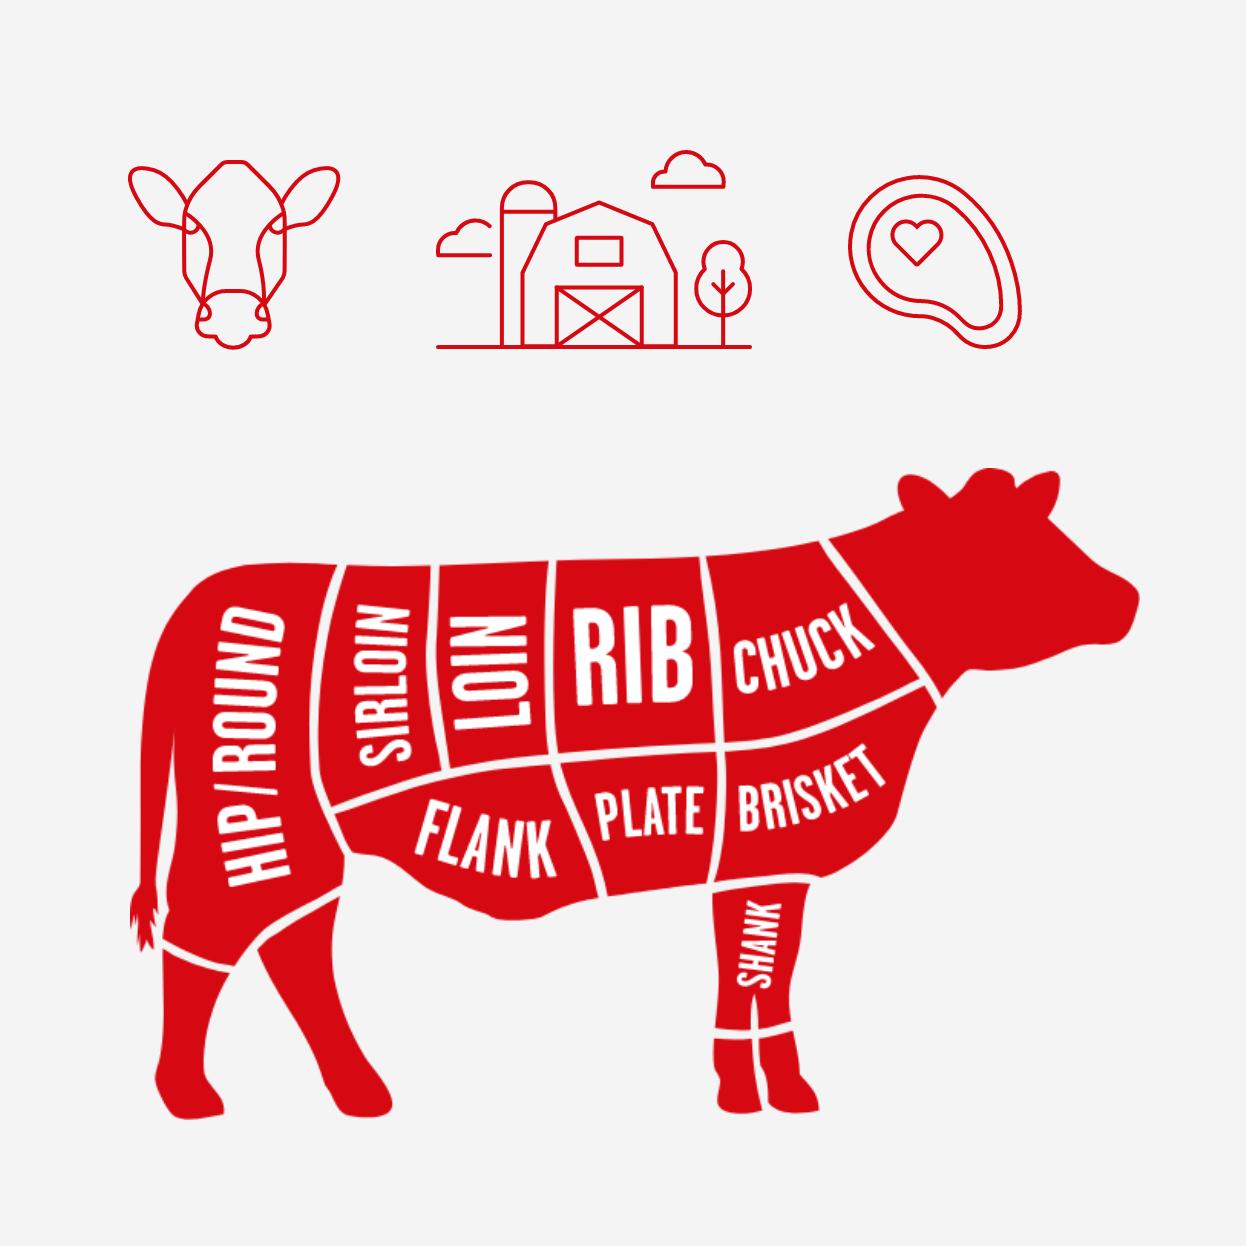 Ontario beef illustrations